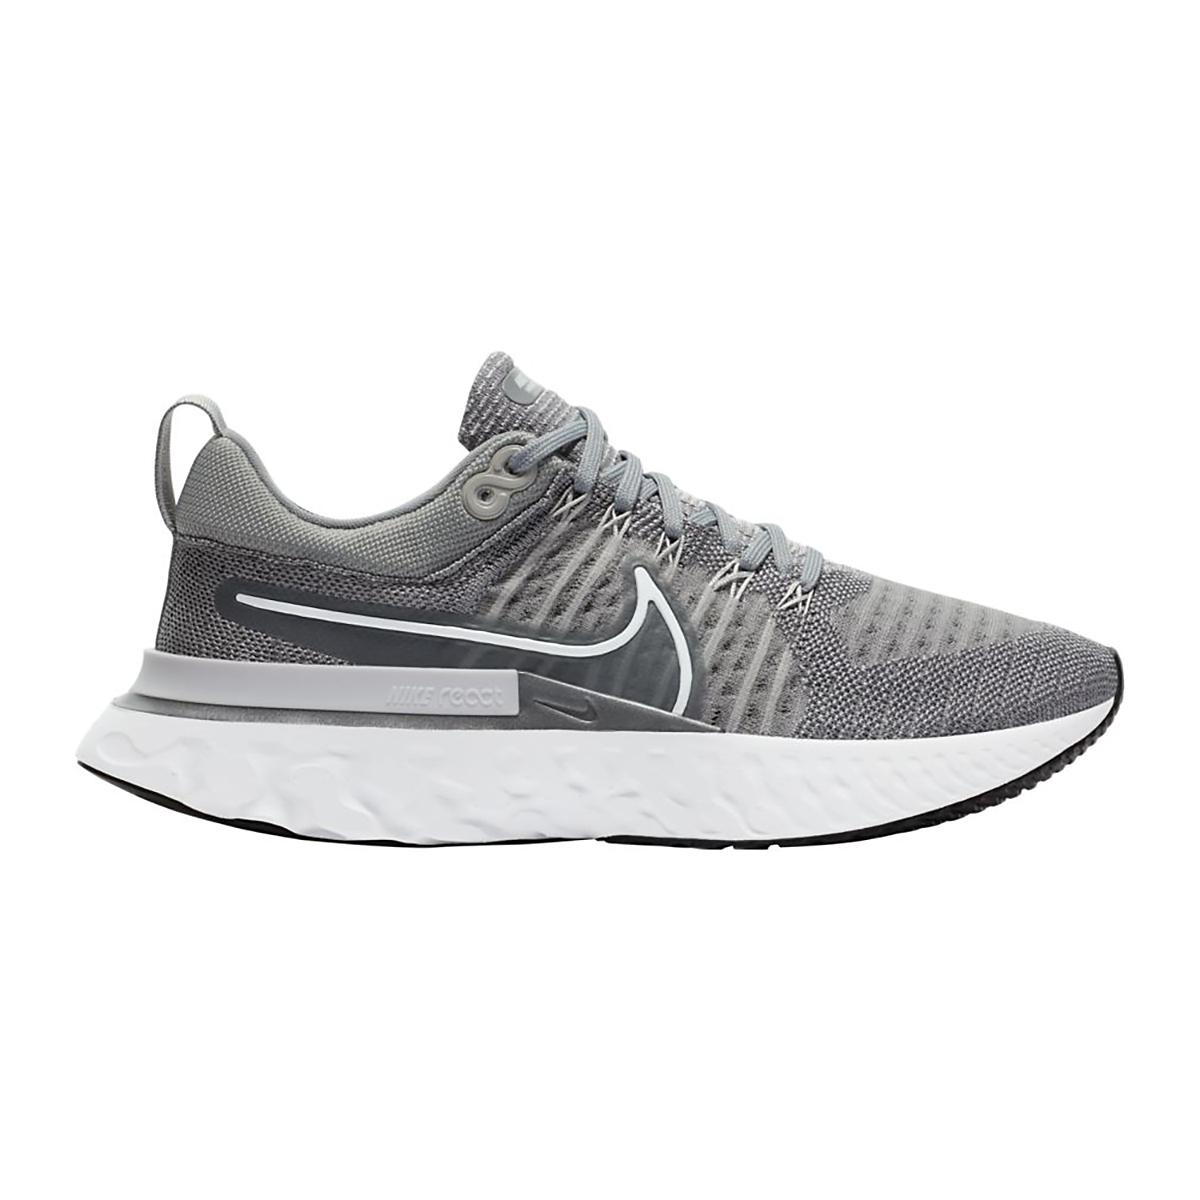 Women's Nike React Infinity Run Flyknit 2 Running Shoe - Color: Particle Grey/White/Grey Fog/Black - Size: 5 - Width: Regular, Particle Grey/White/Grey Fog/Black, large, image 1